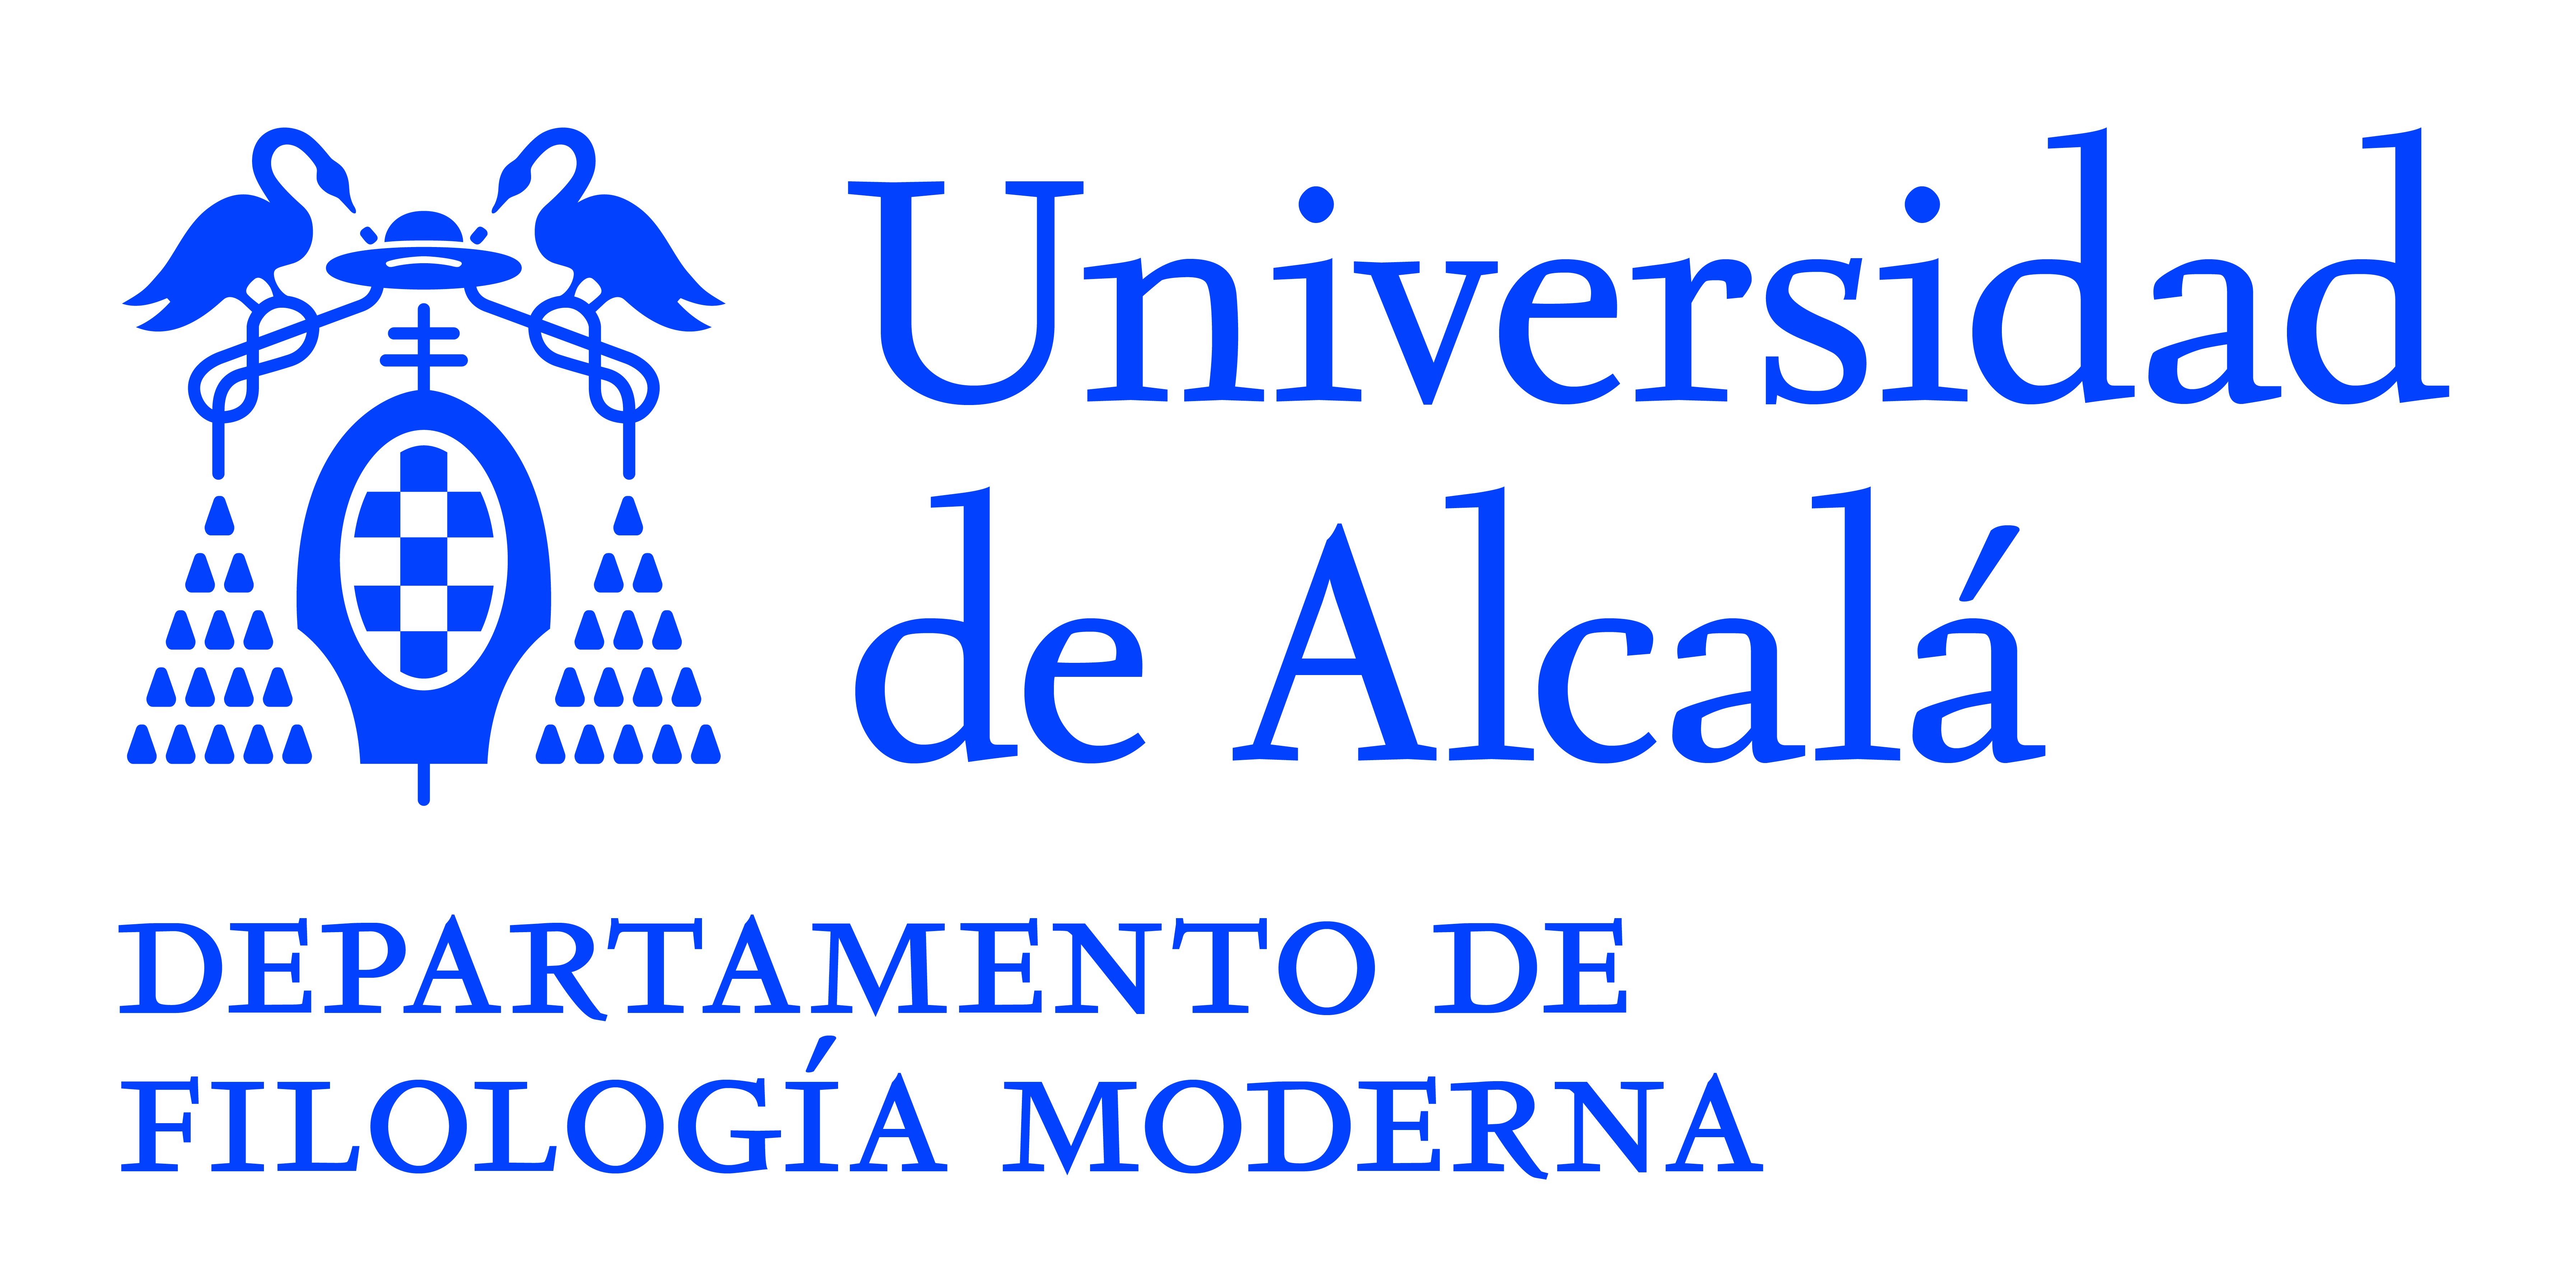 Dpto. Filología Moderna Universidad de Alcalá